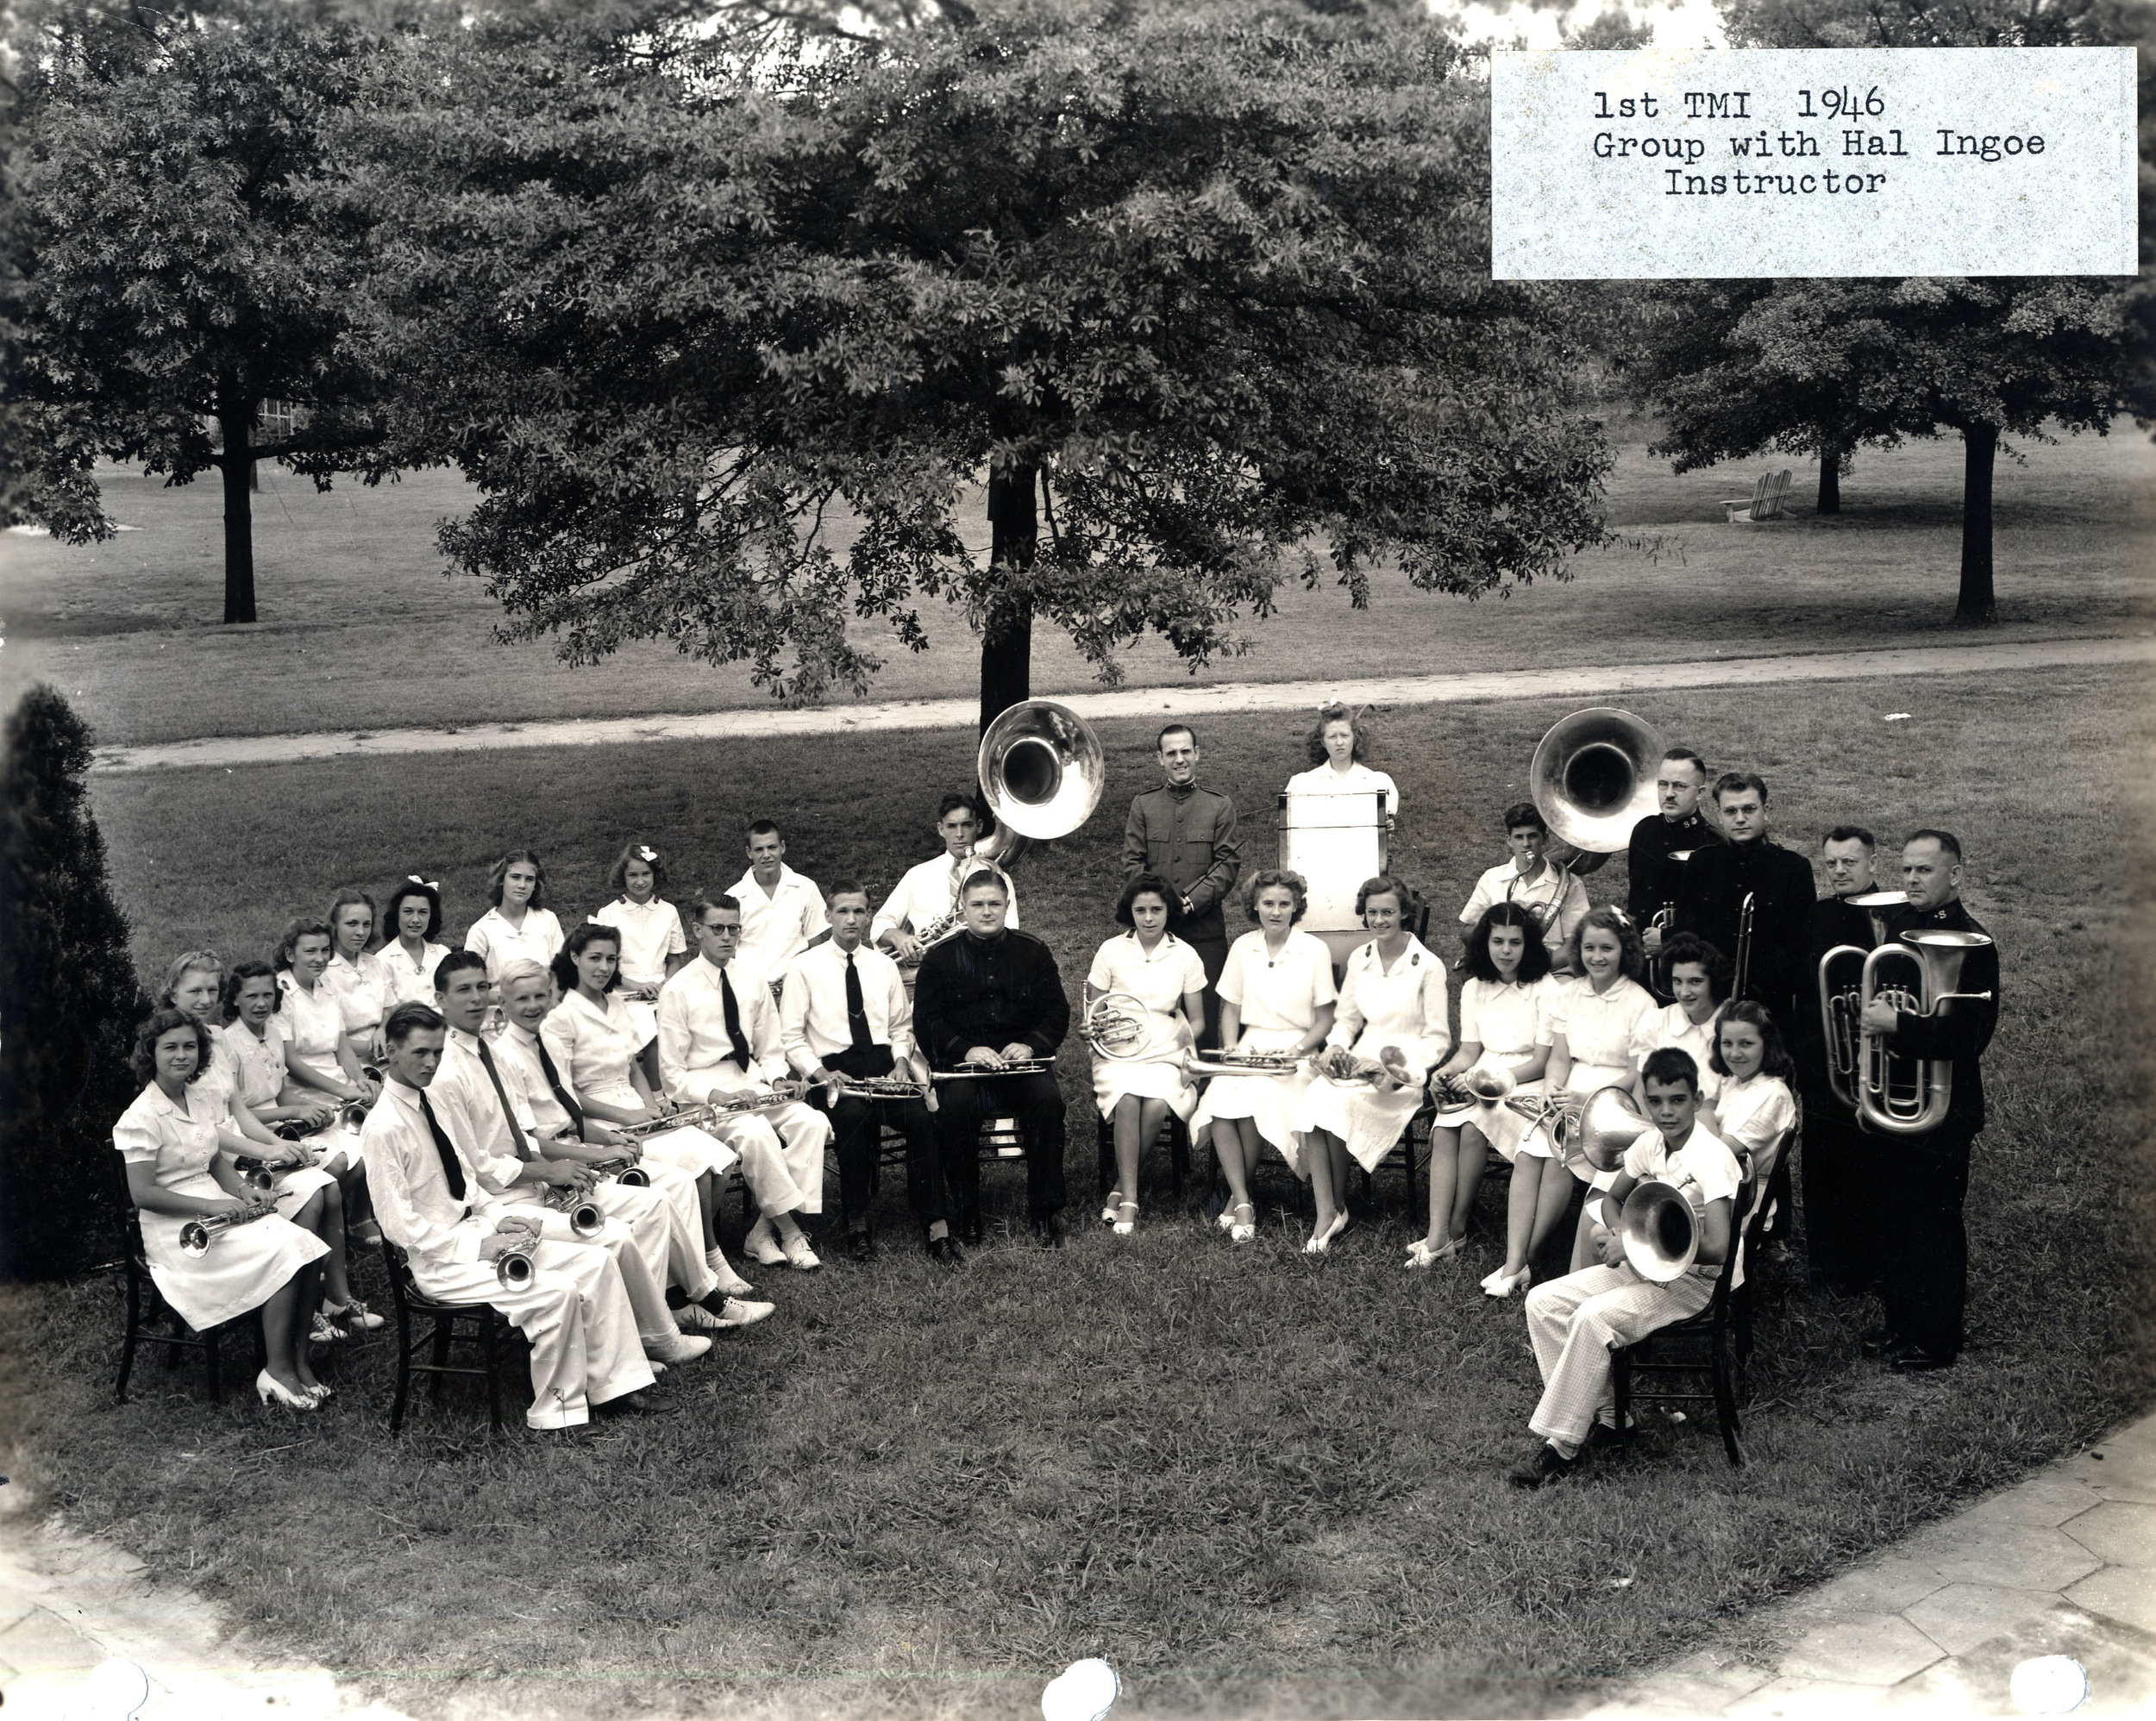 """B"" Band - TMI 1940"